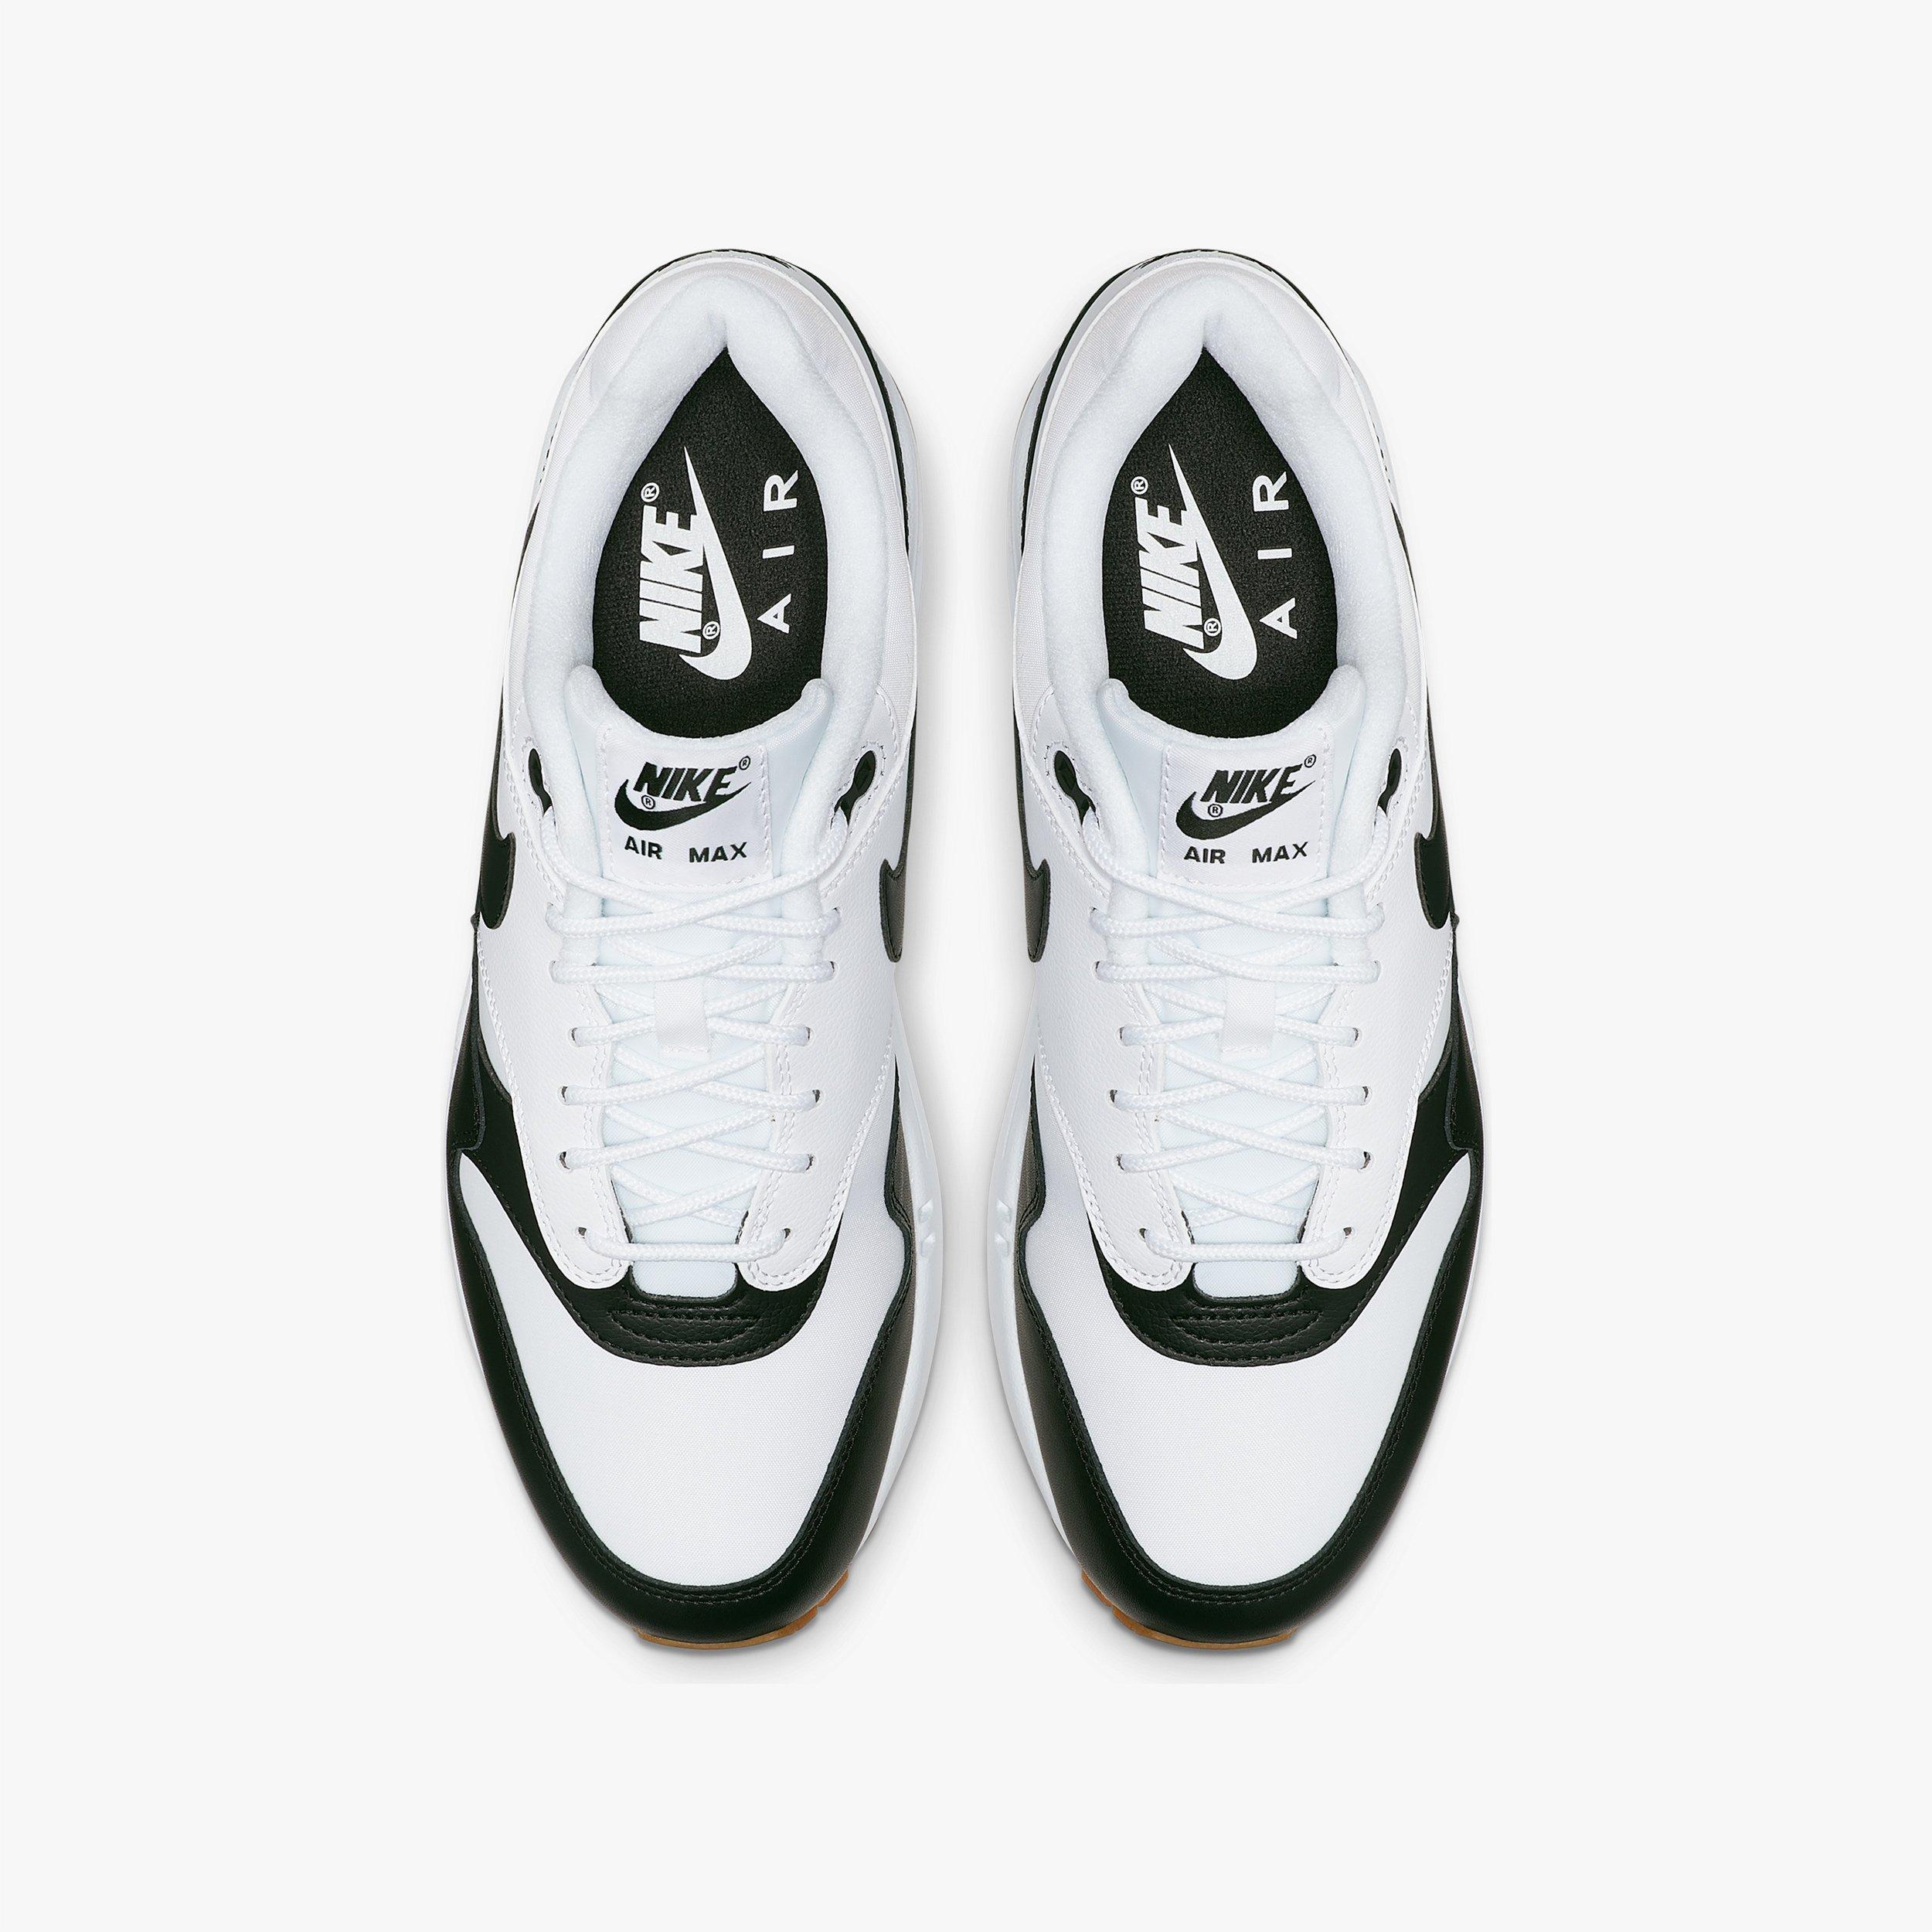 Nike Air Max 1 SE - Cq9965-100 - SNS | sneakers & streetwear ...